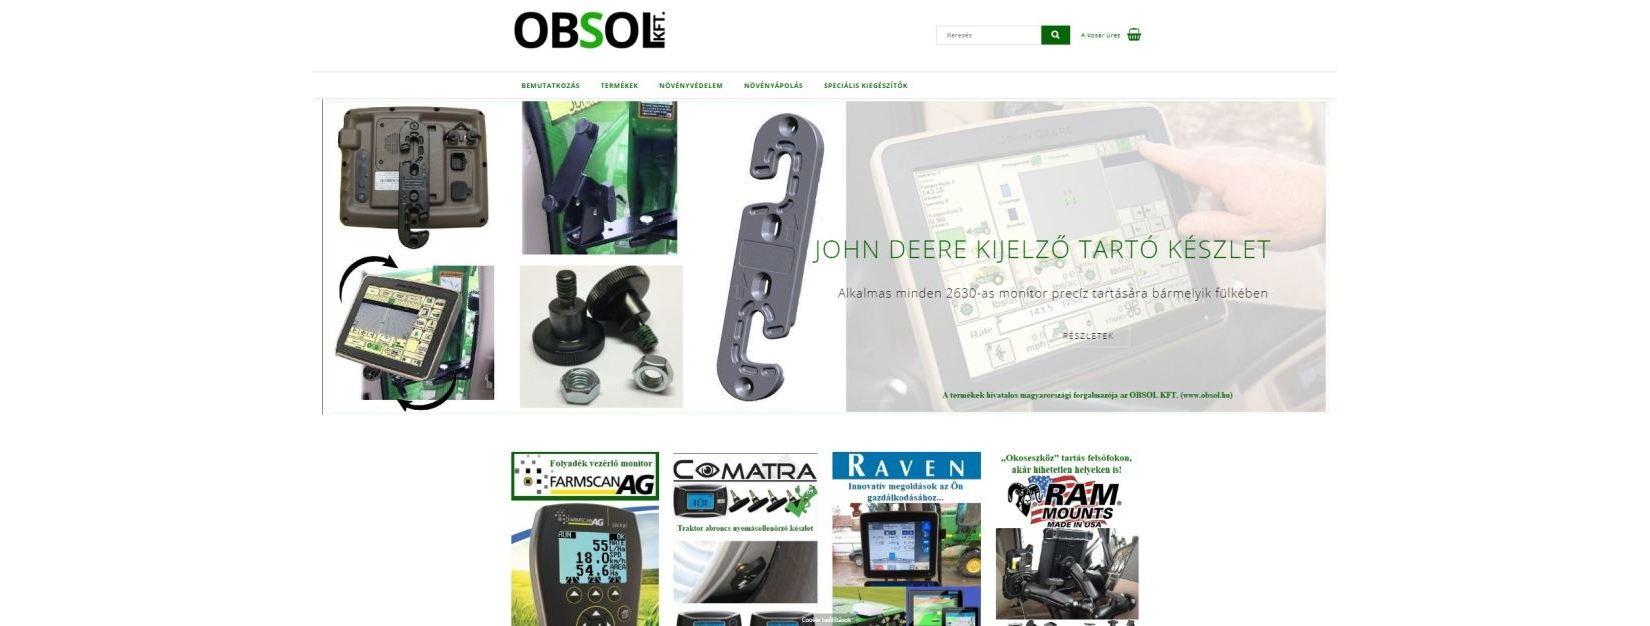 https://webshop.obsol.hu/